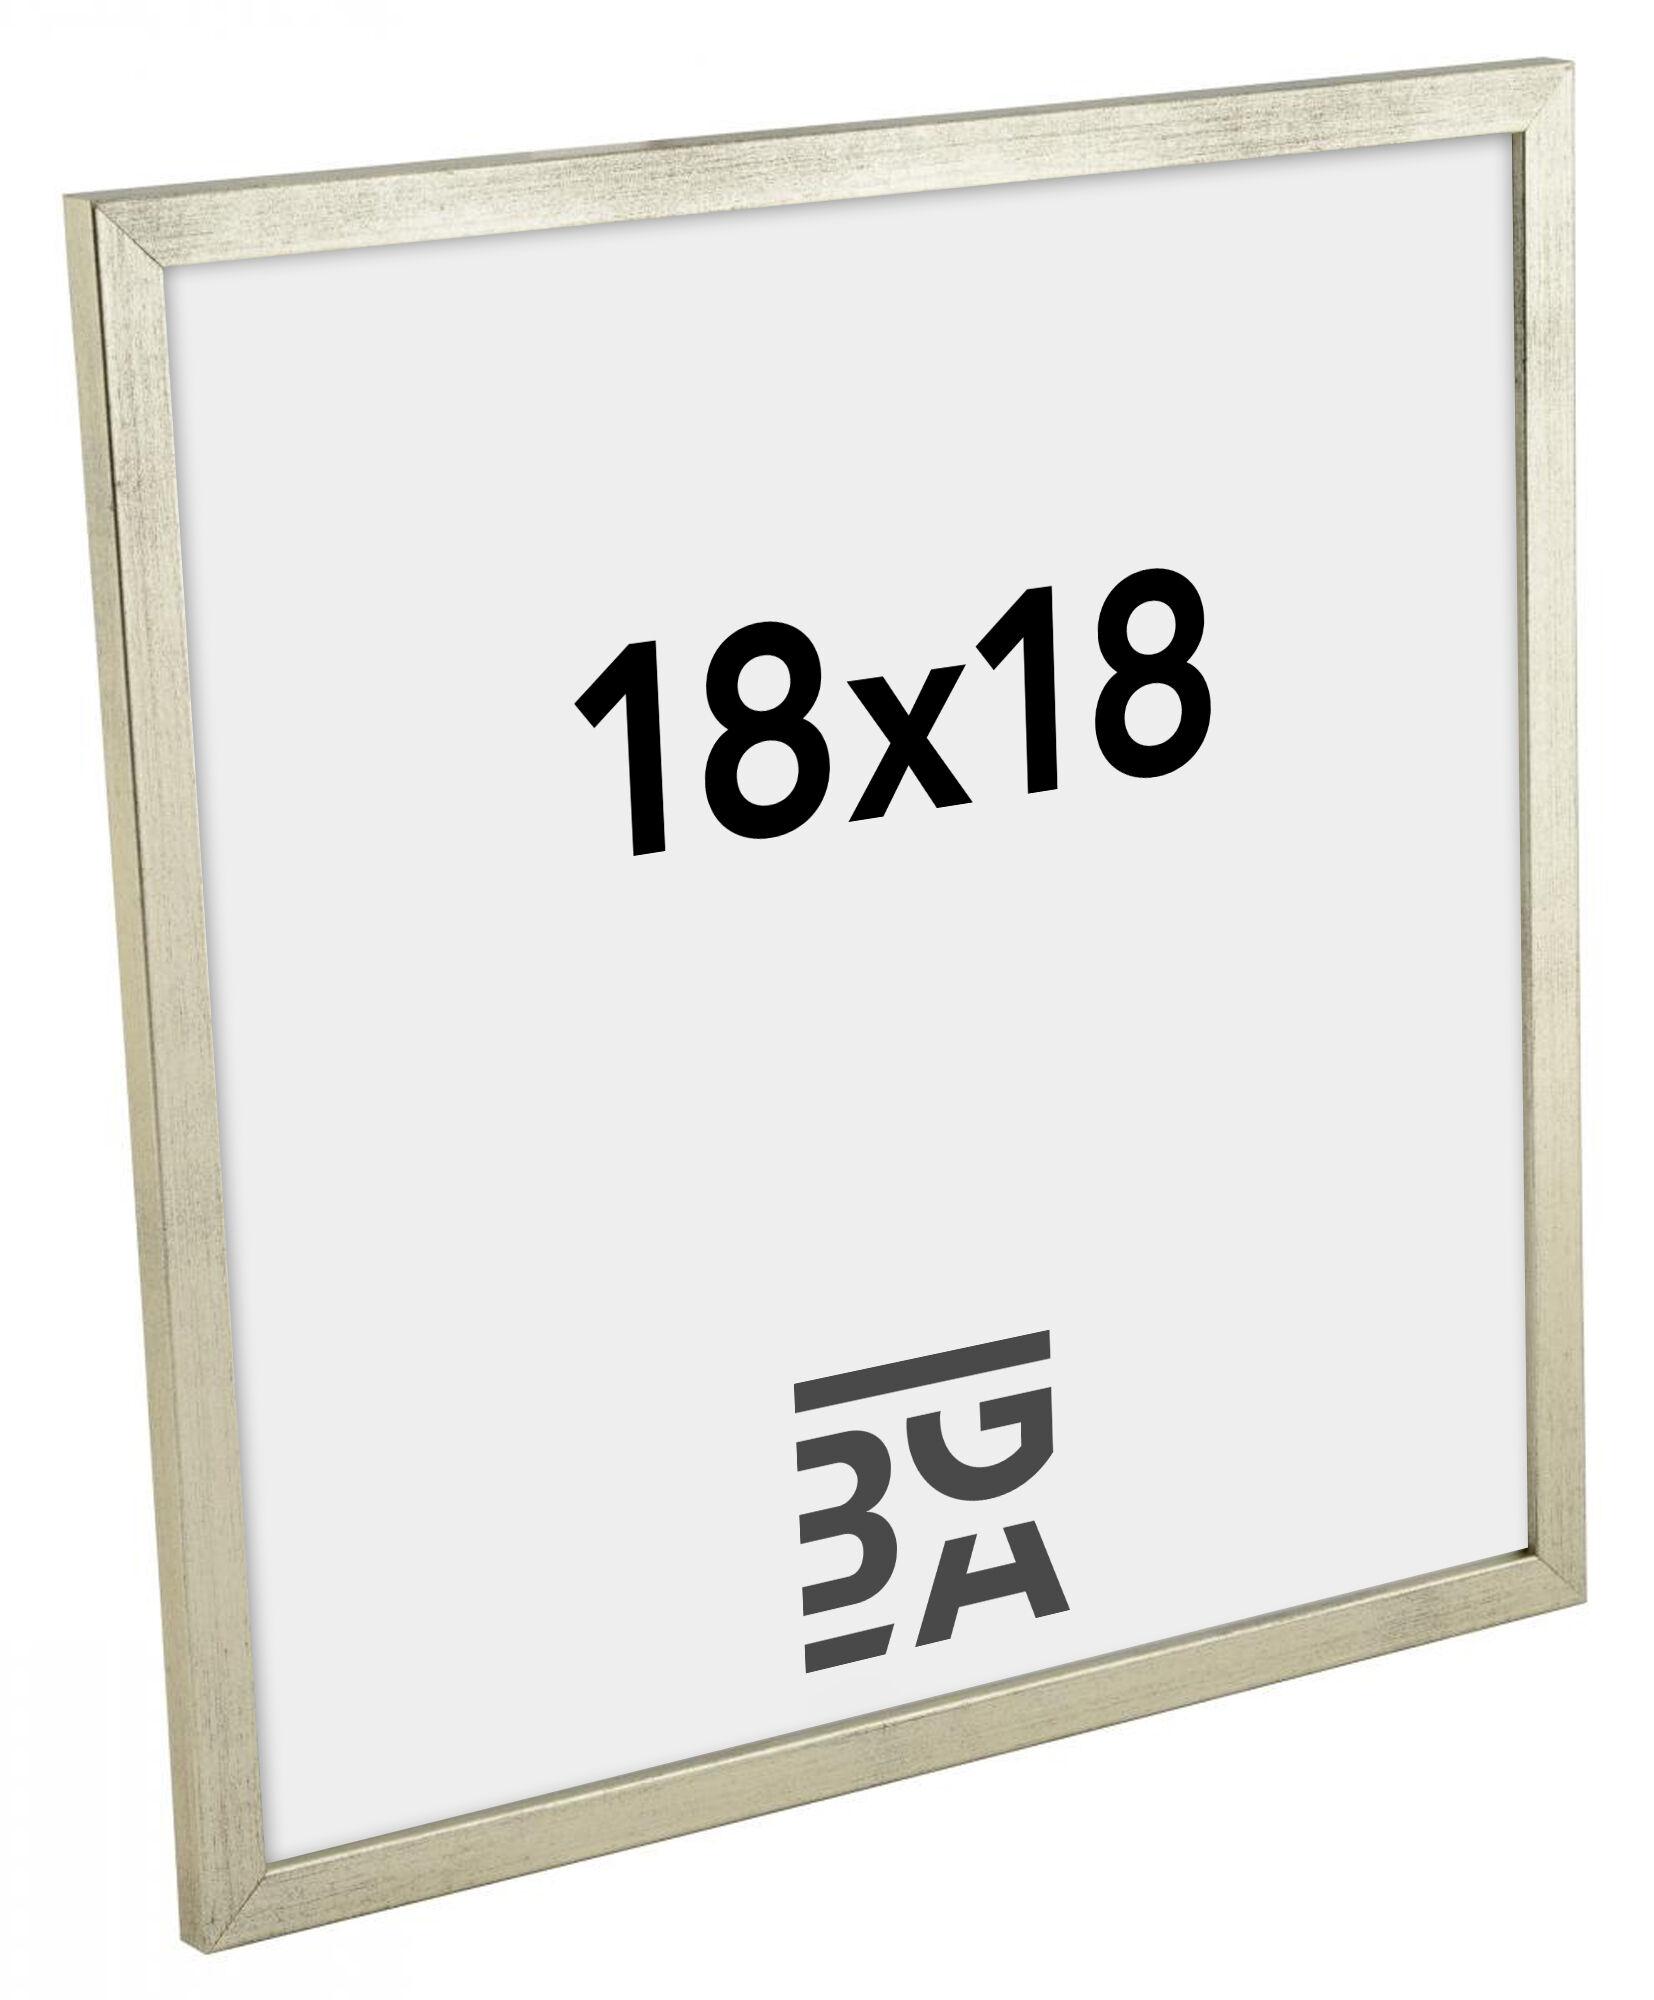 Estancia Galant Hopeanvärinen 18x18 cm